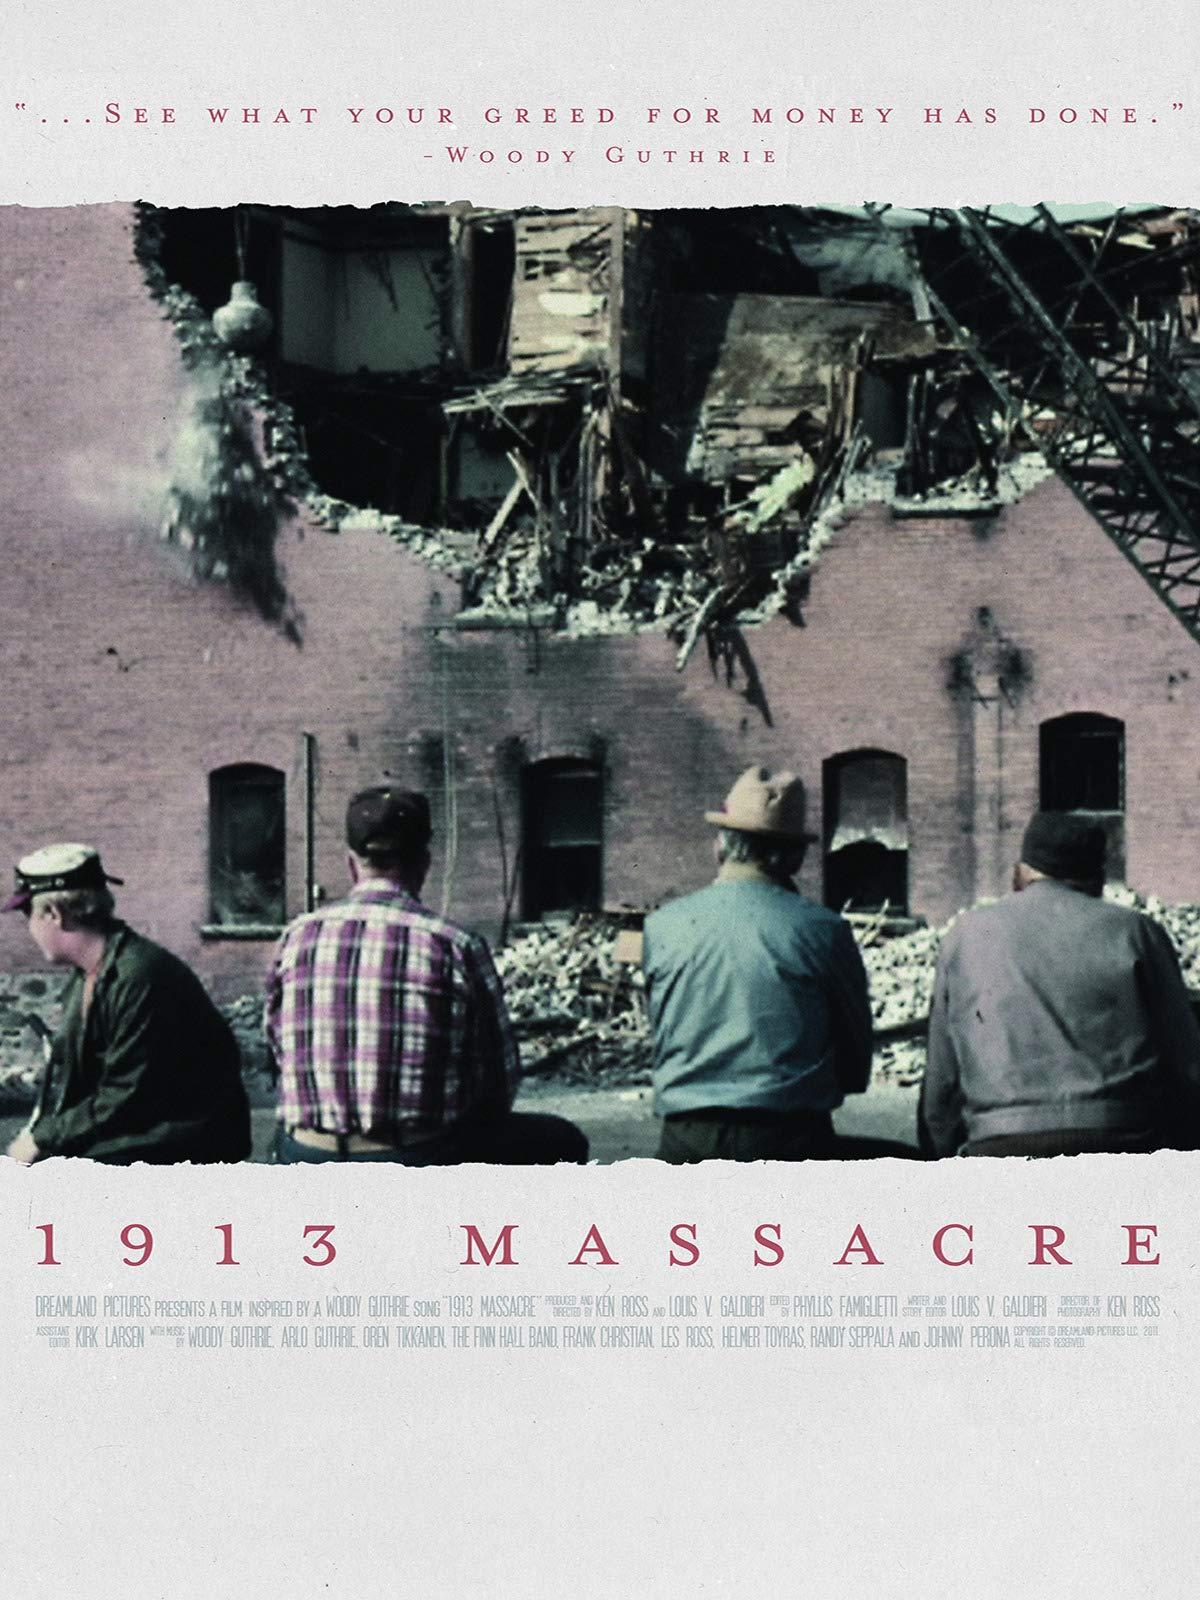 1913 Massacre on Amazon Prime Video UK